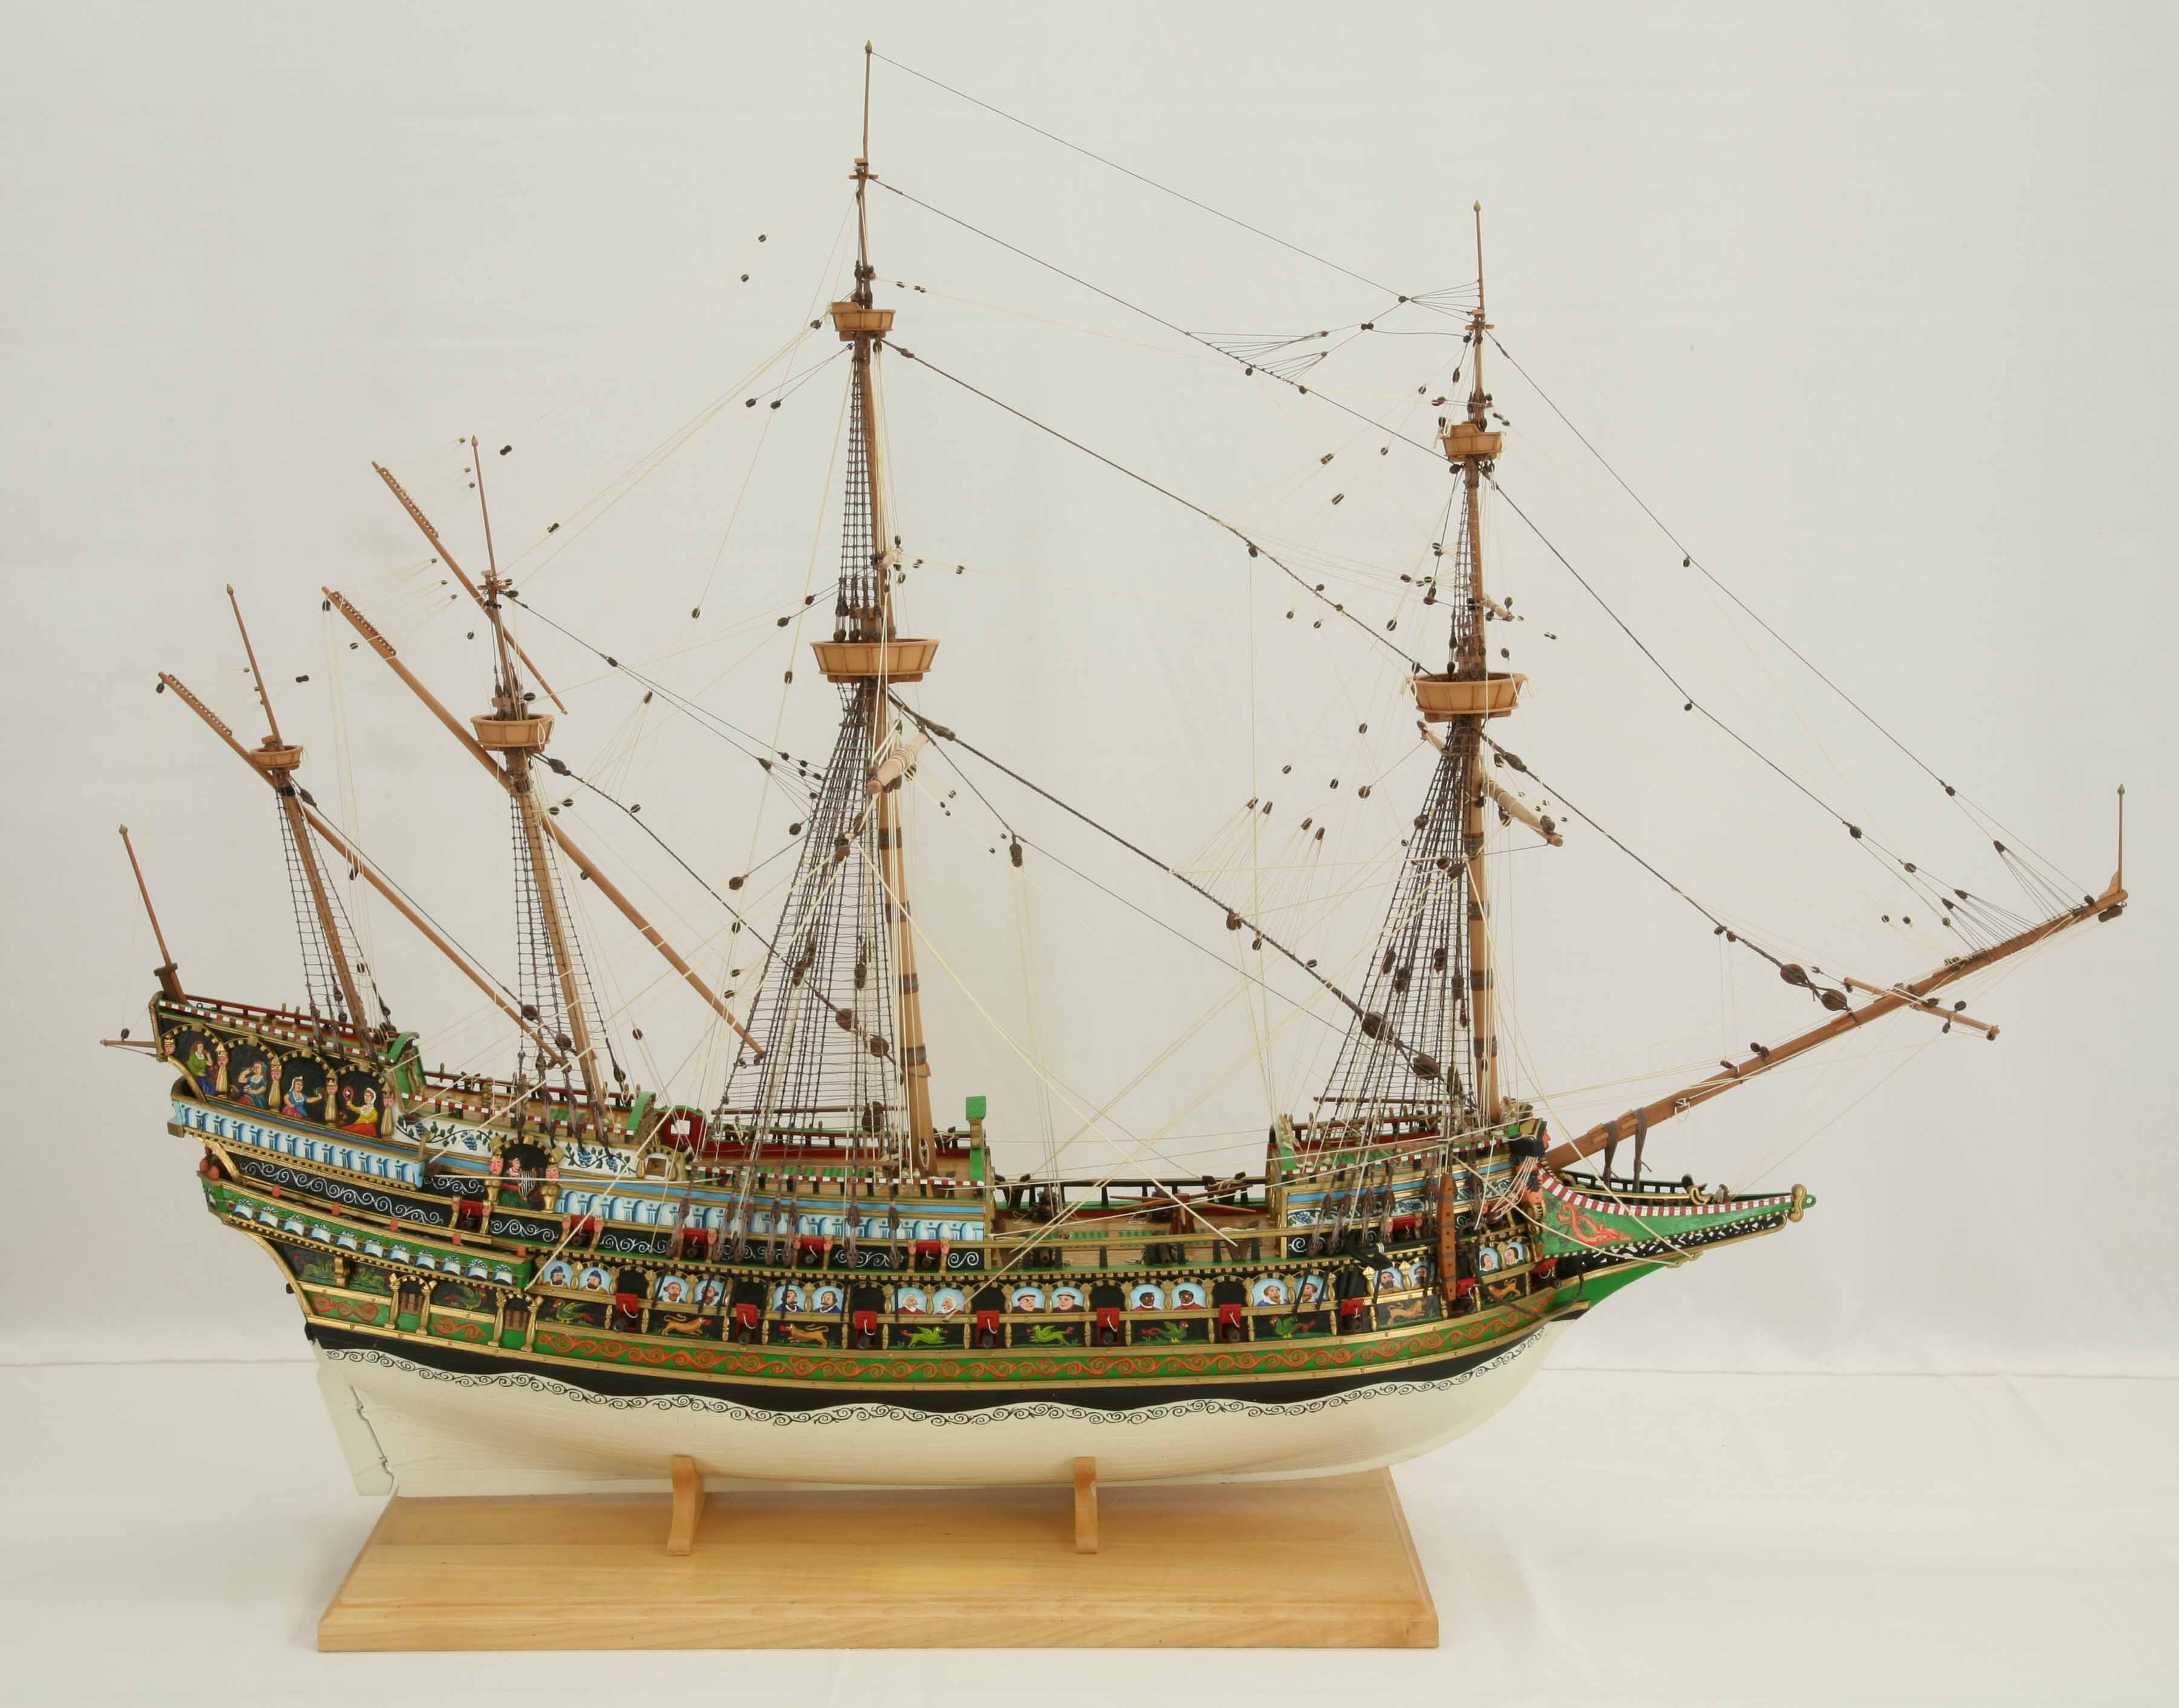 photos of ship model galleon of 1610